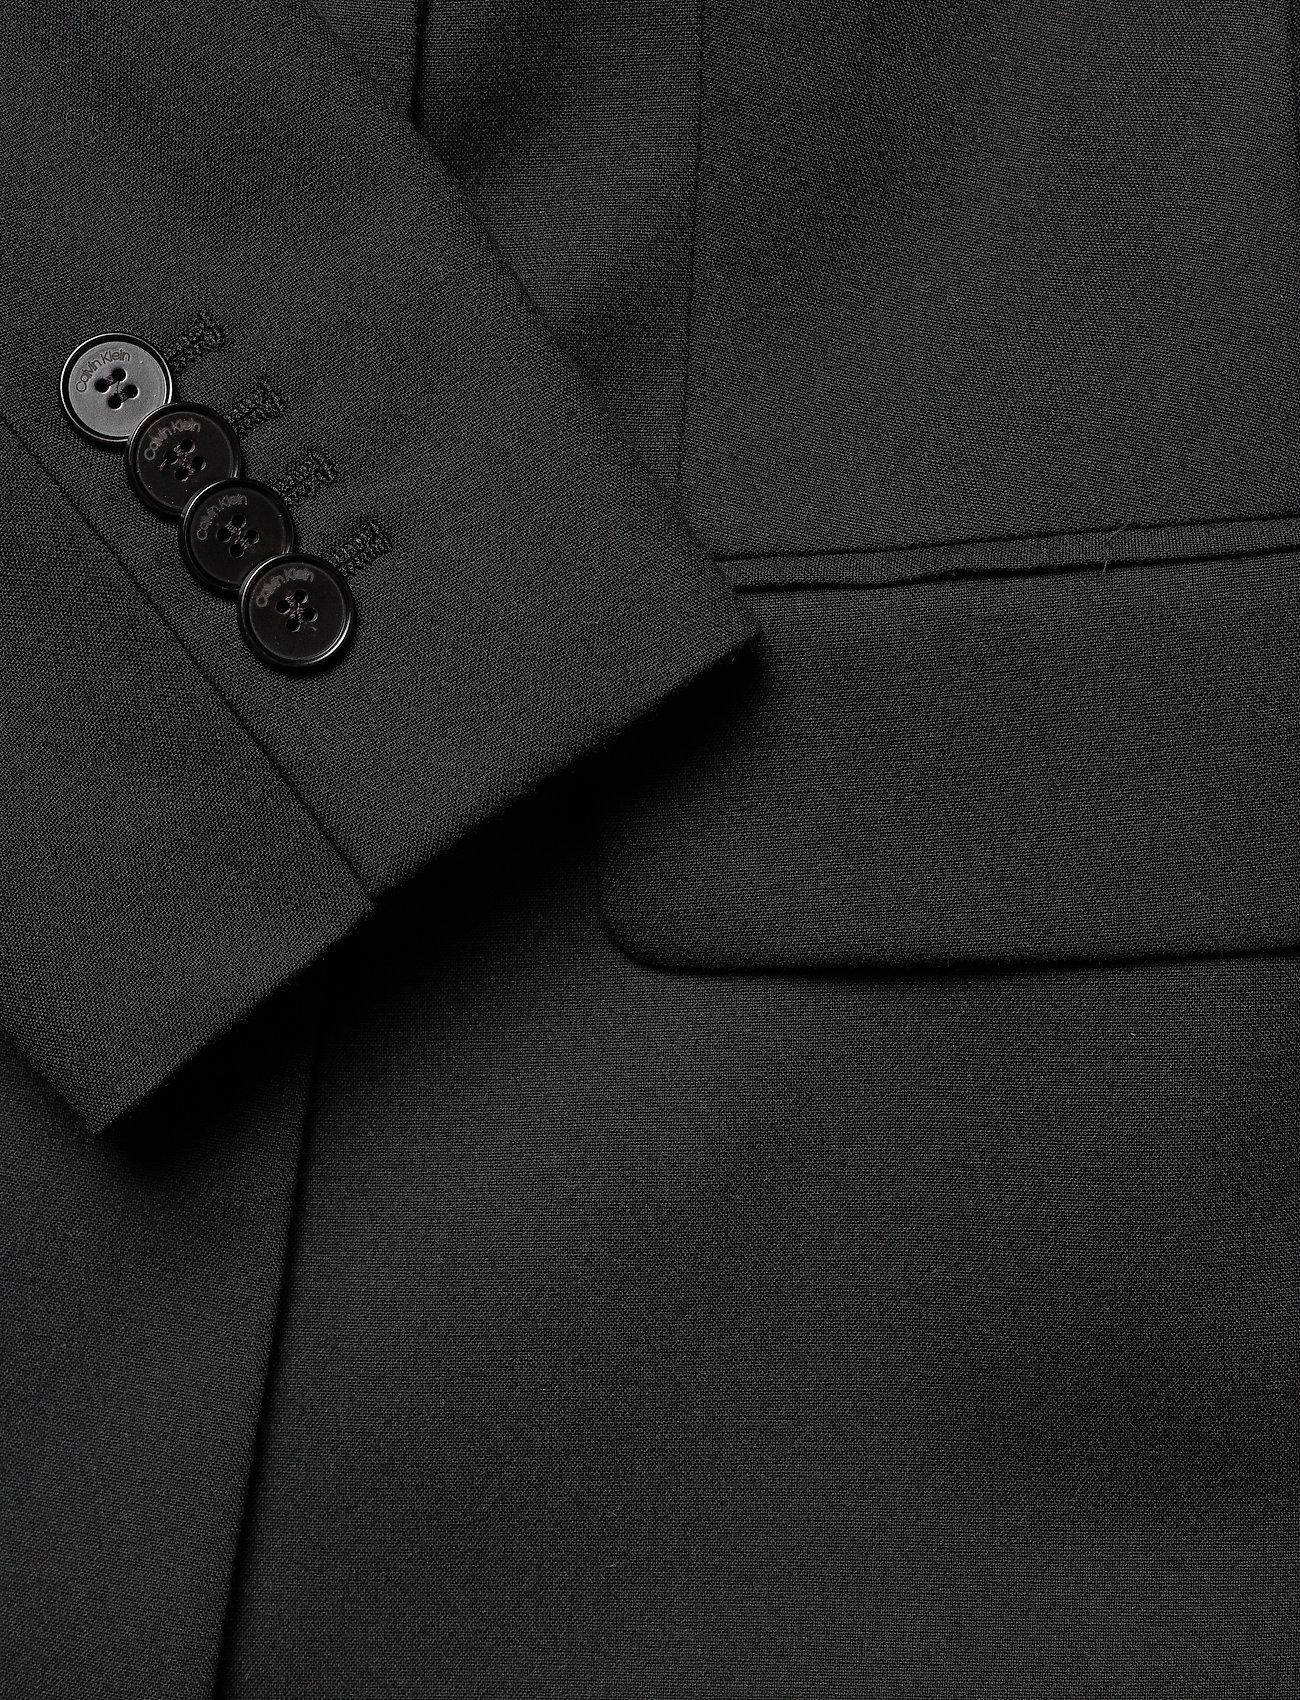 Flannel Db Belted Long Blazer (Calvin Black) (2275 kr) - Calvin Klein